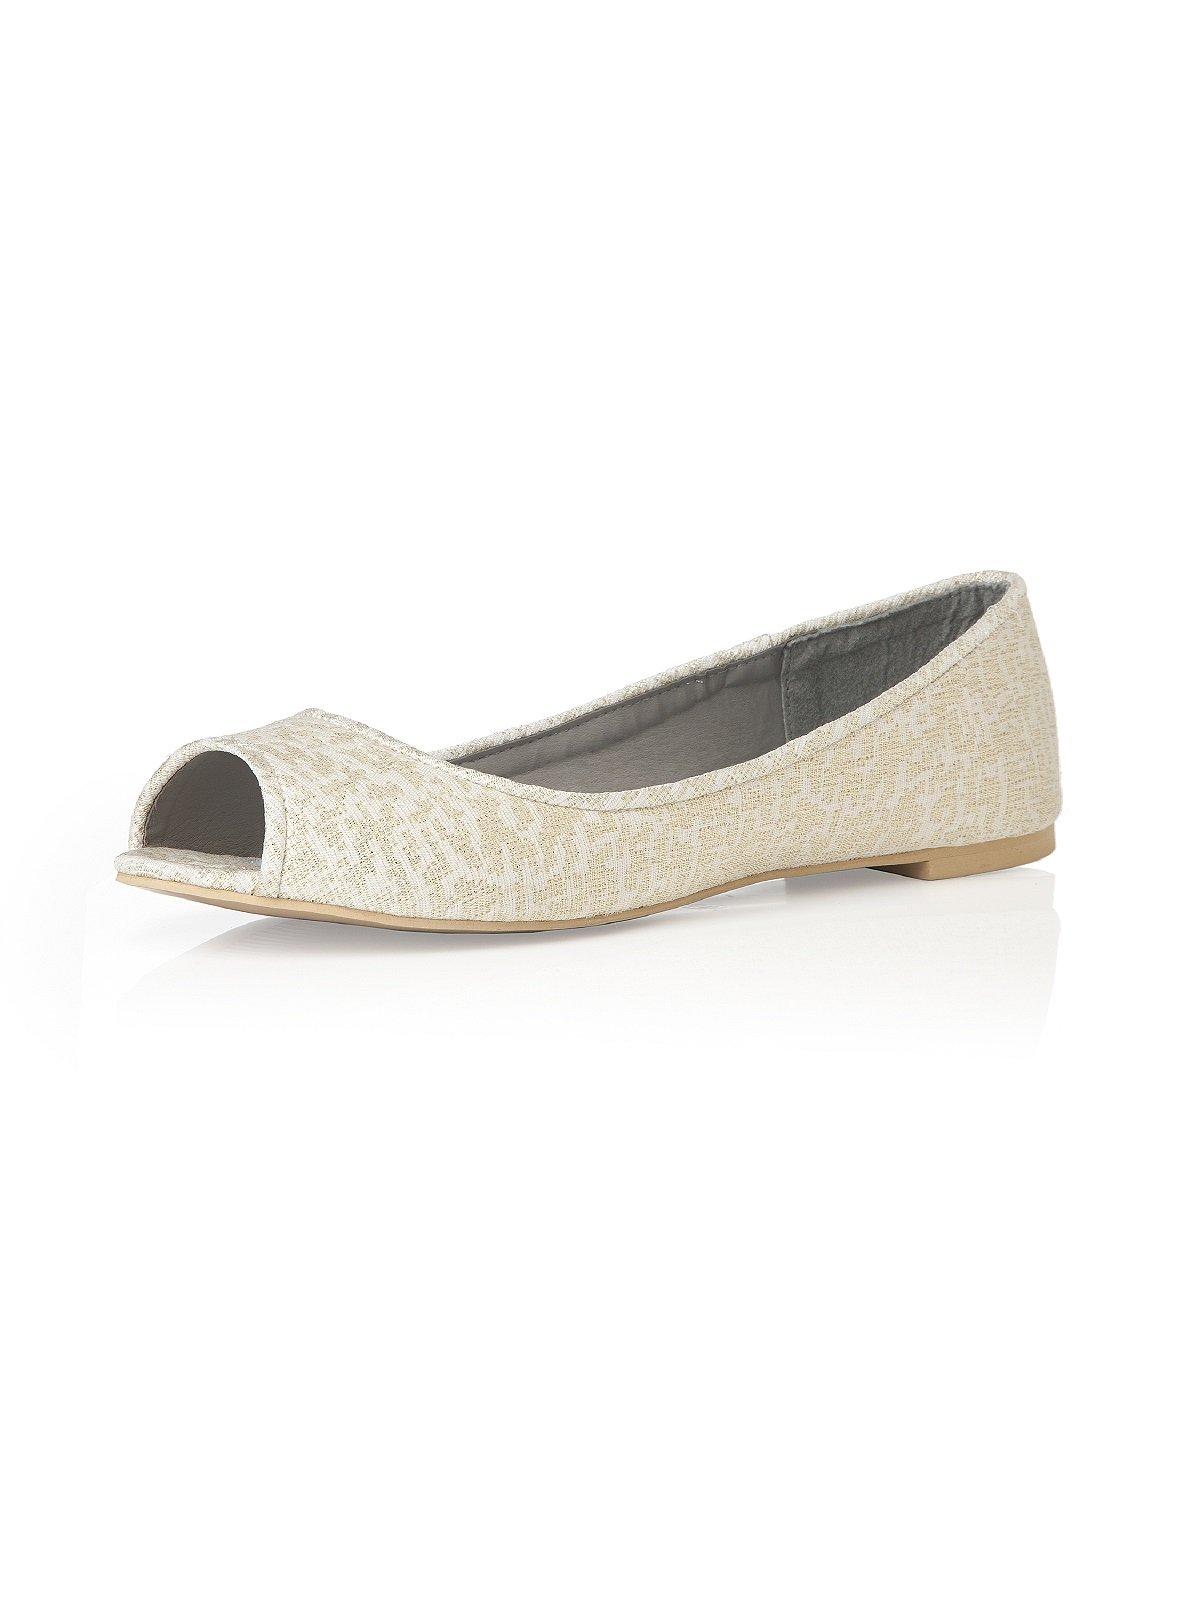 Dessy Women's PARK AVENUE Lace Peep Toe Ballet Flats Ivory Gold - Size 7